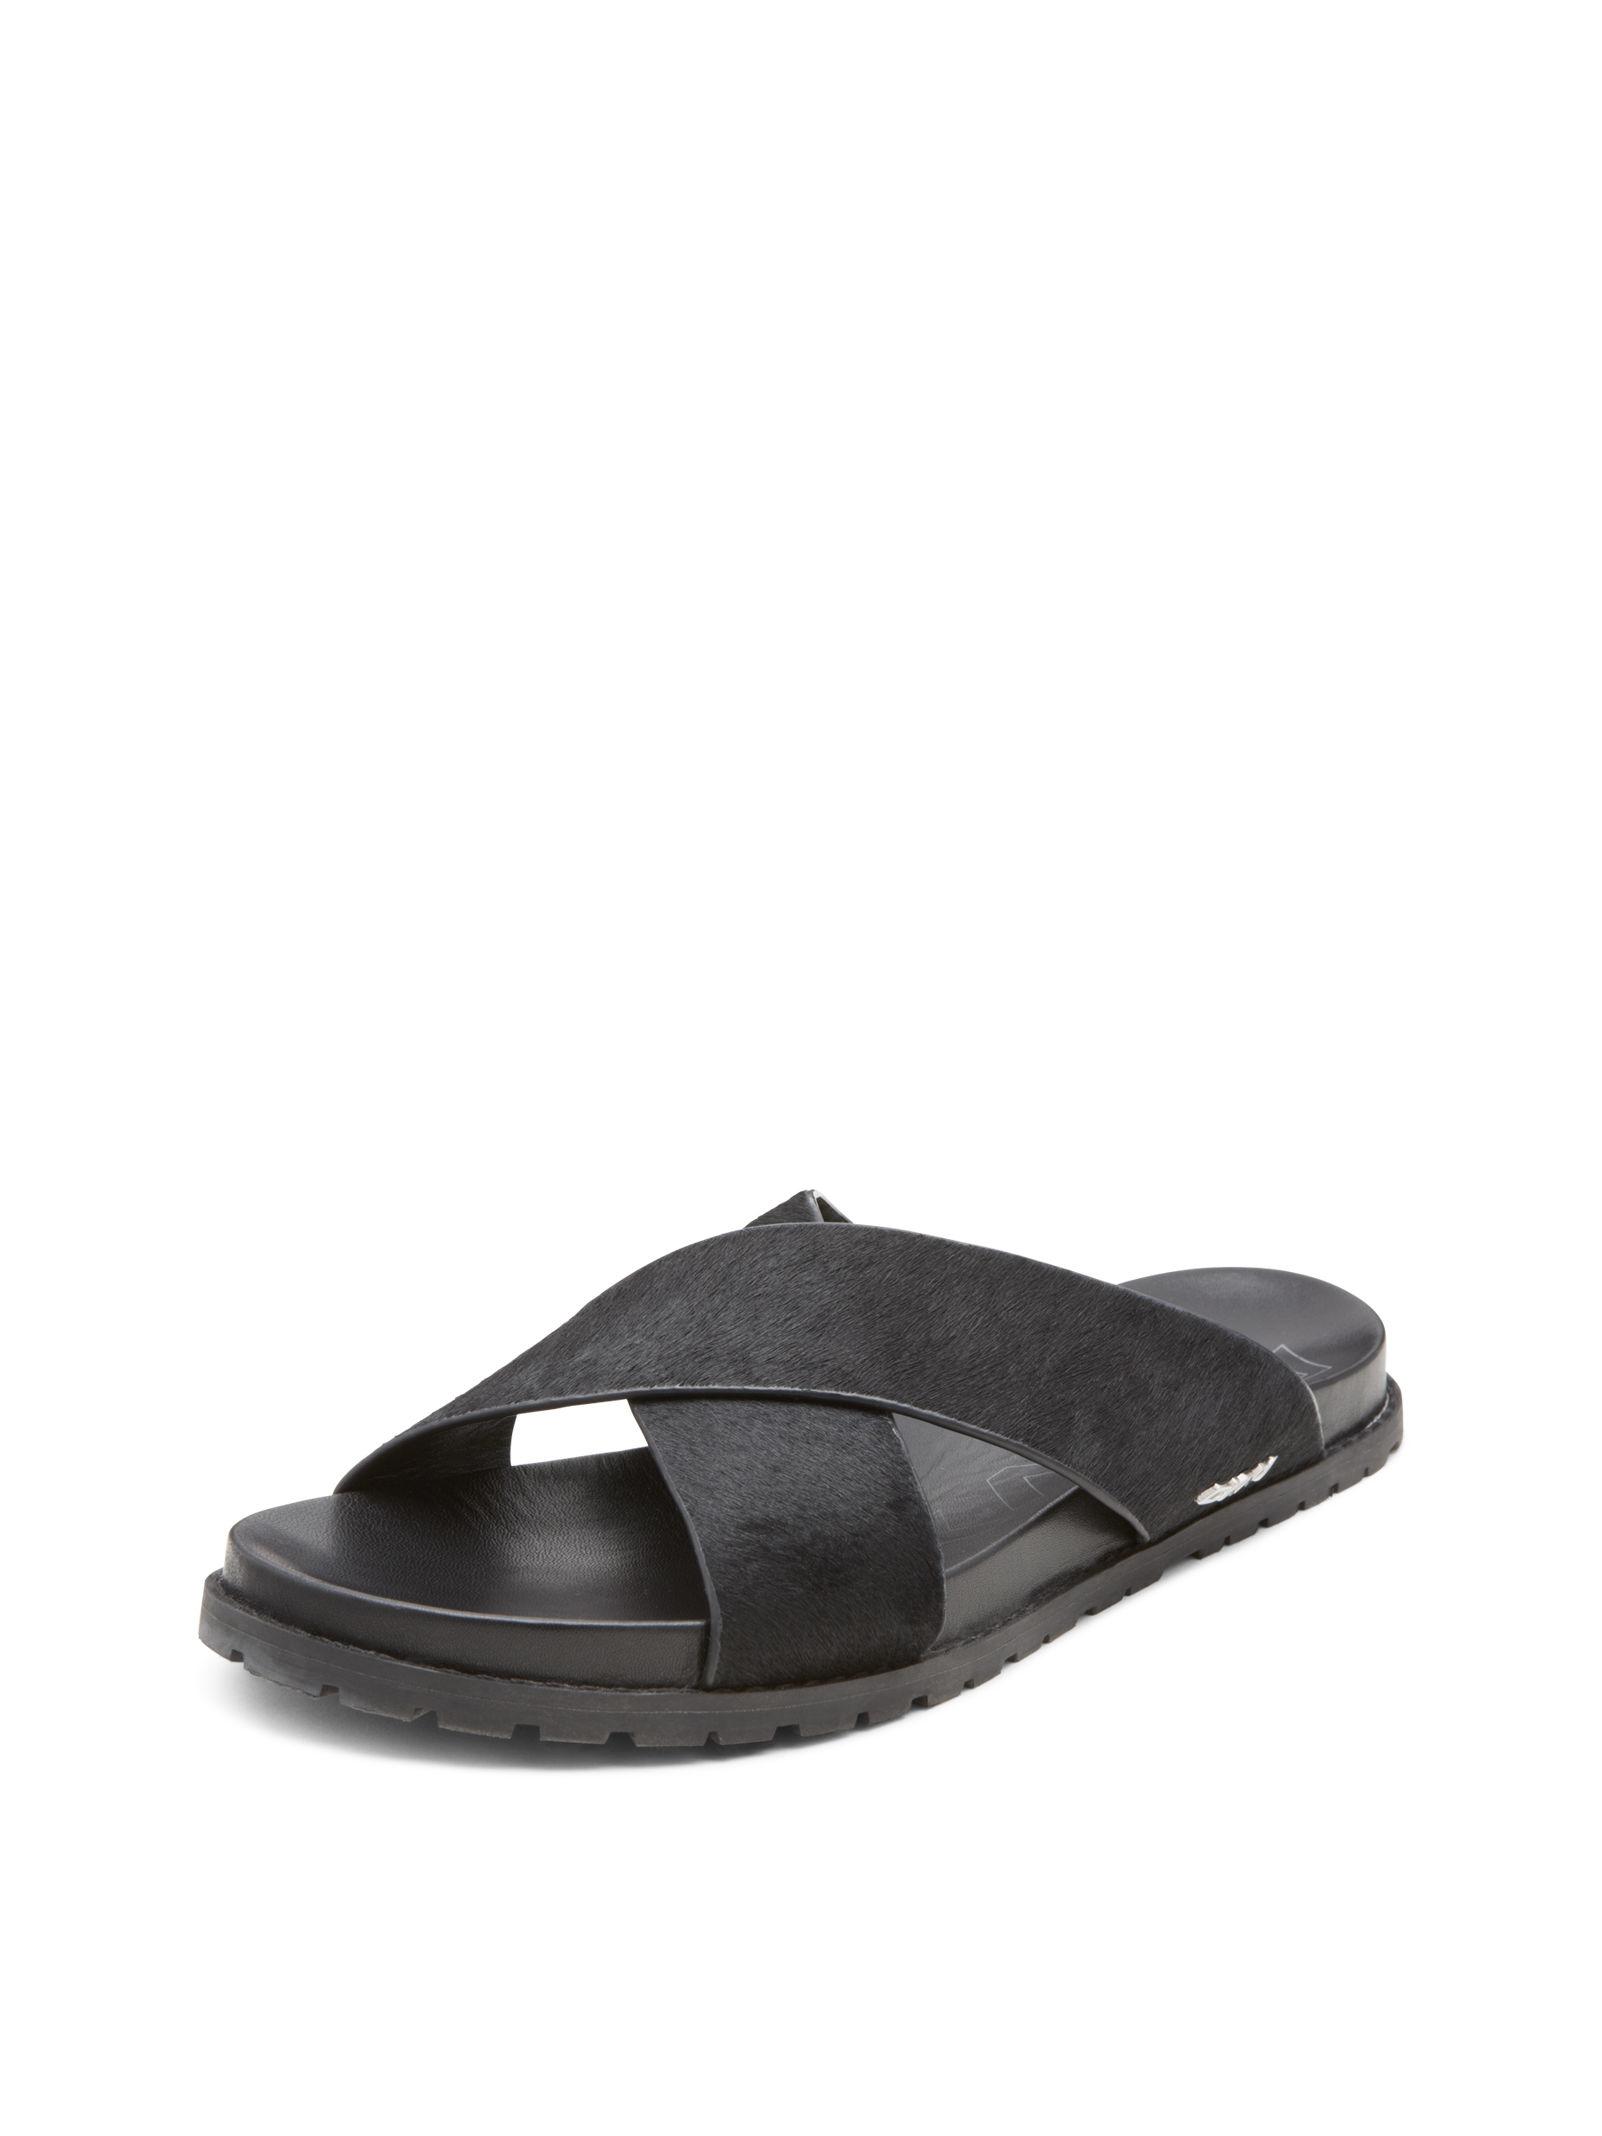 dkny steph haircalf leather sandal in black for men lyst